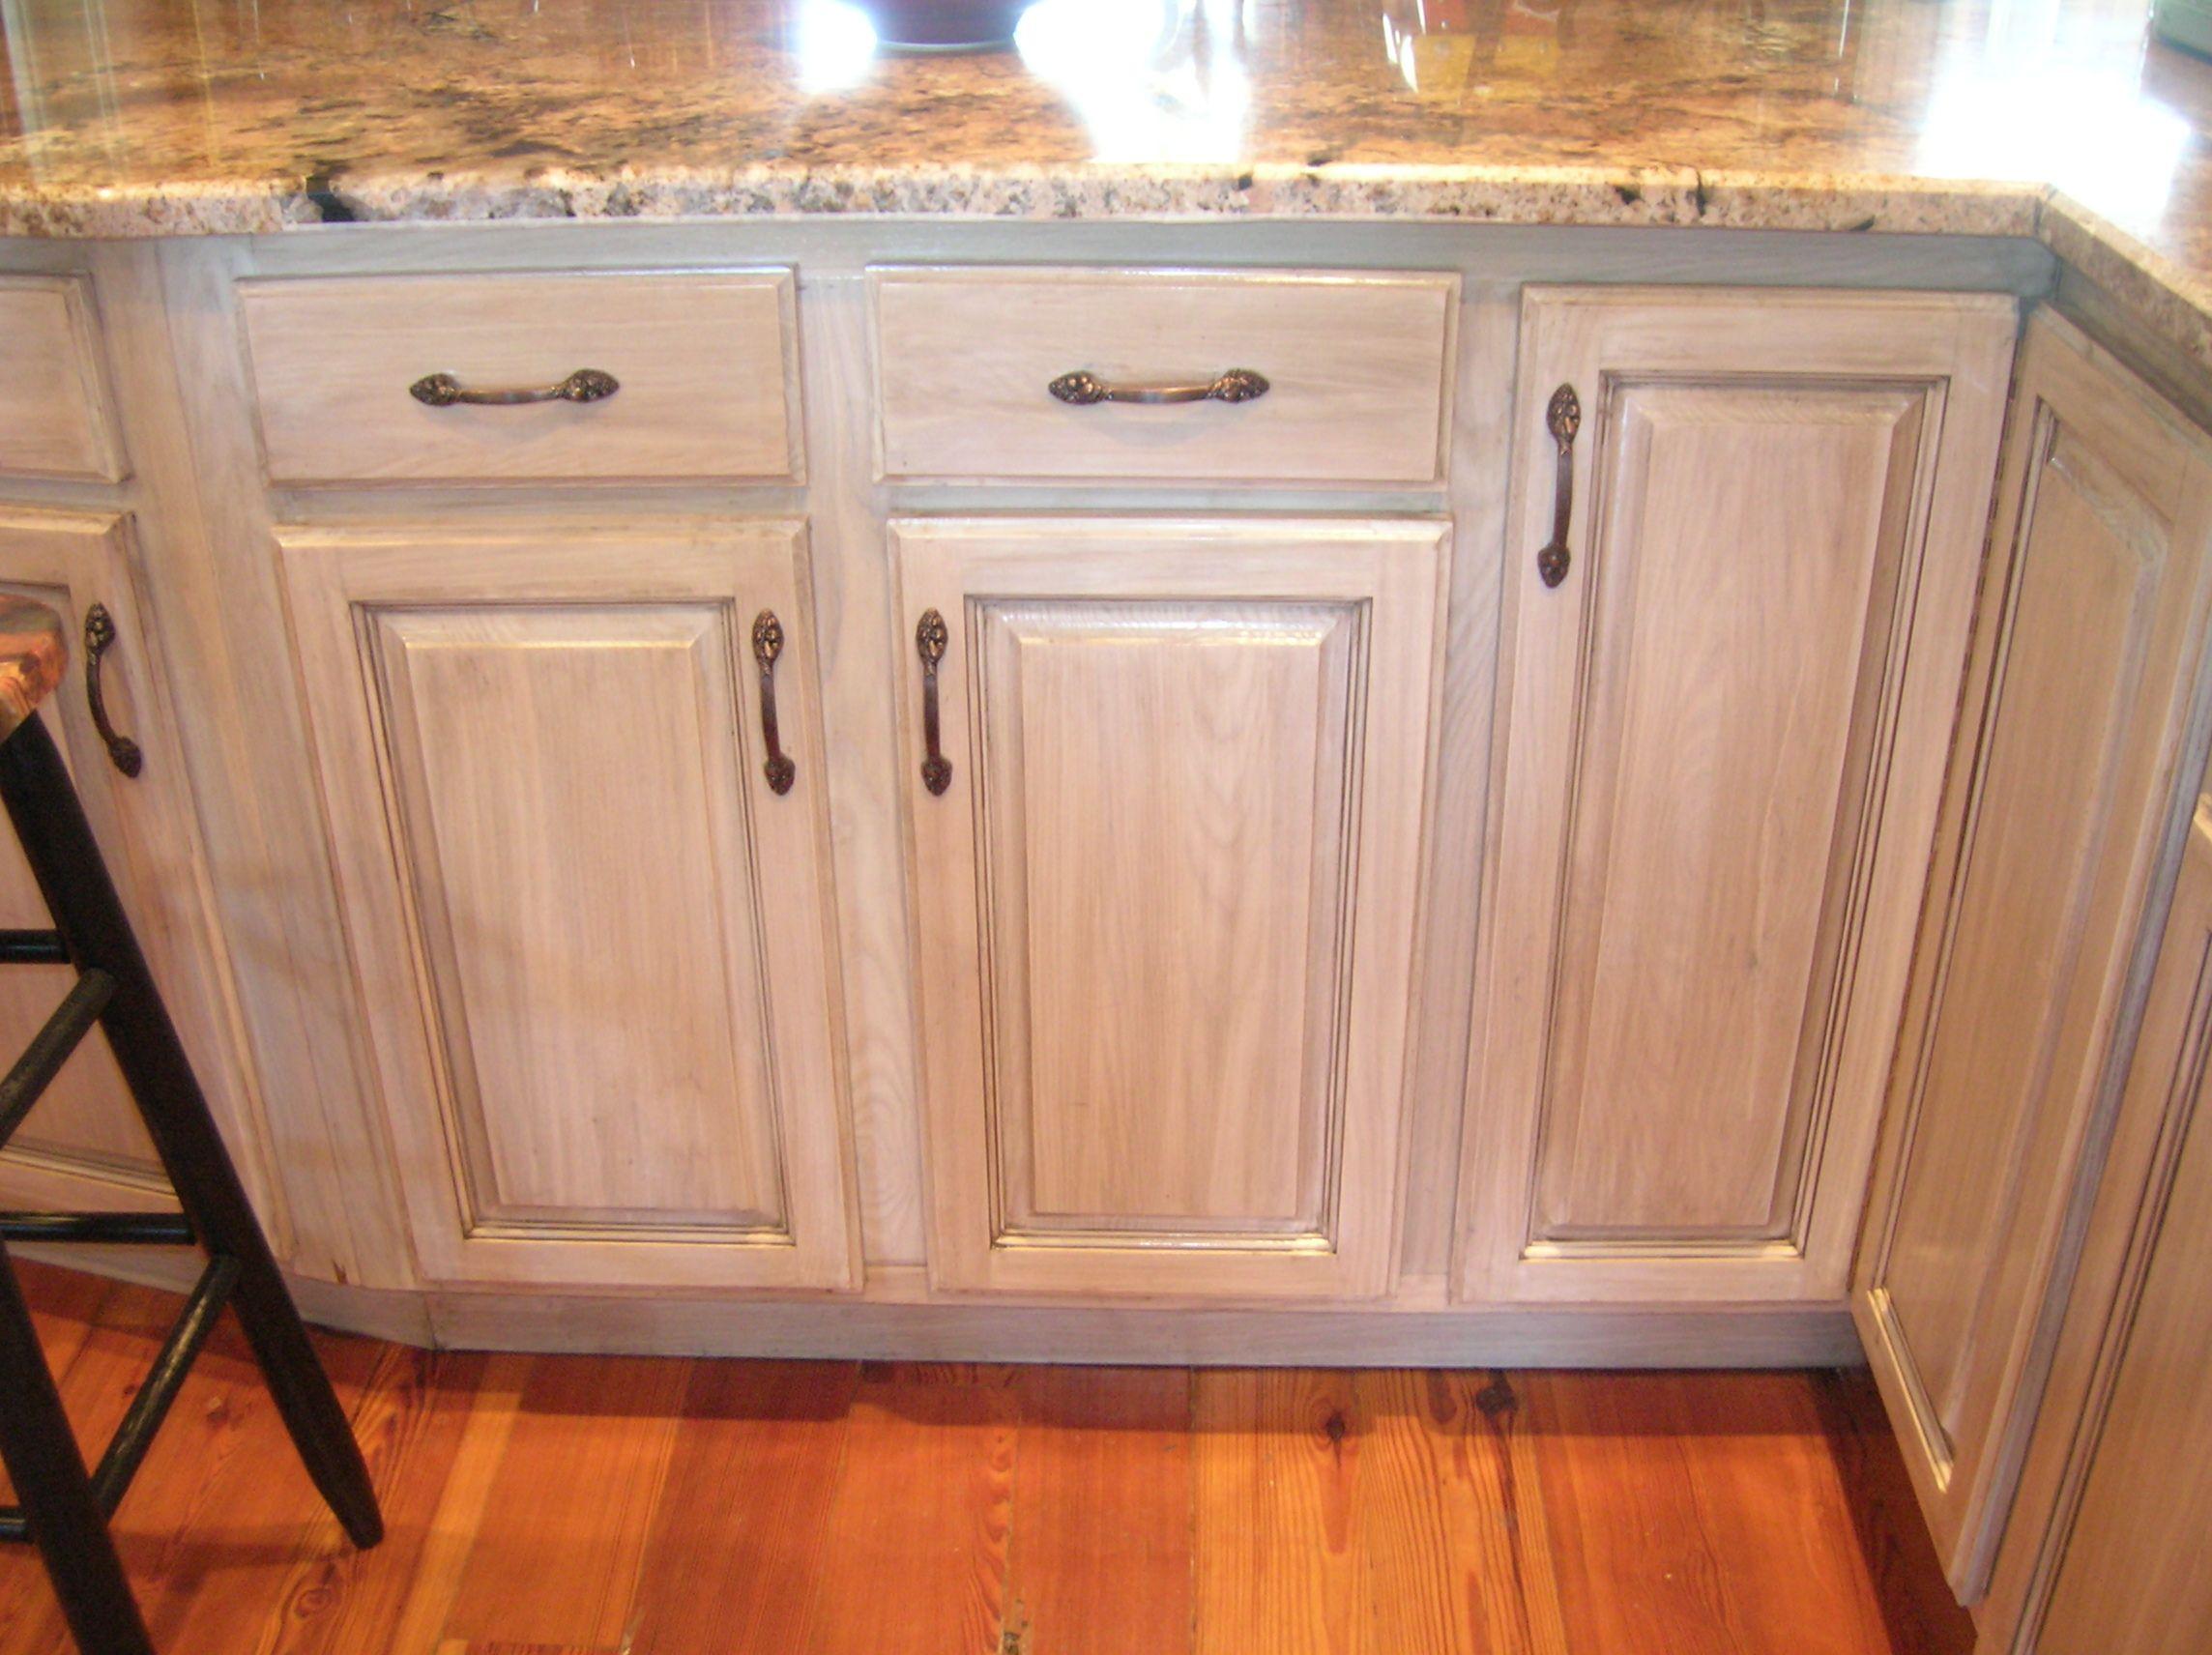 Pickled Oak Cabinets Before After Oak Armoire Before Oak